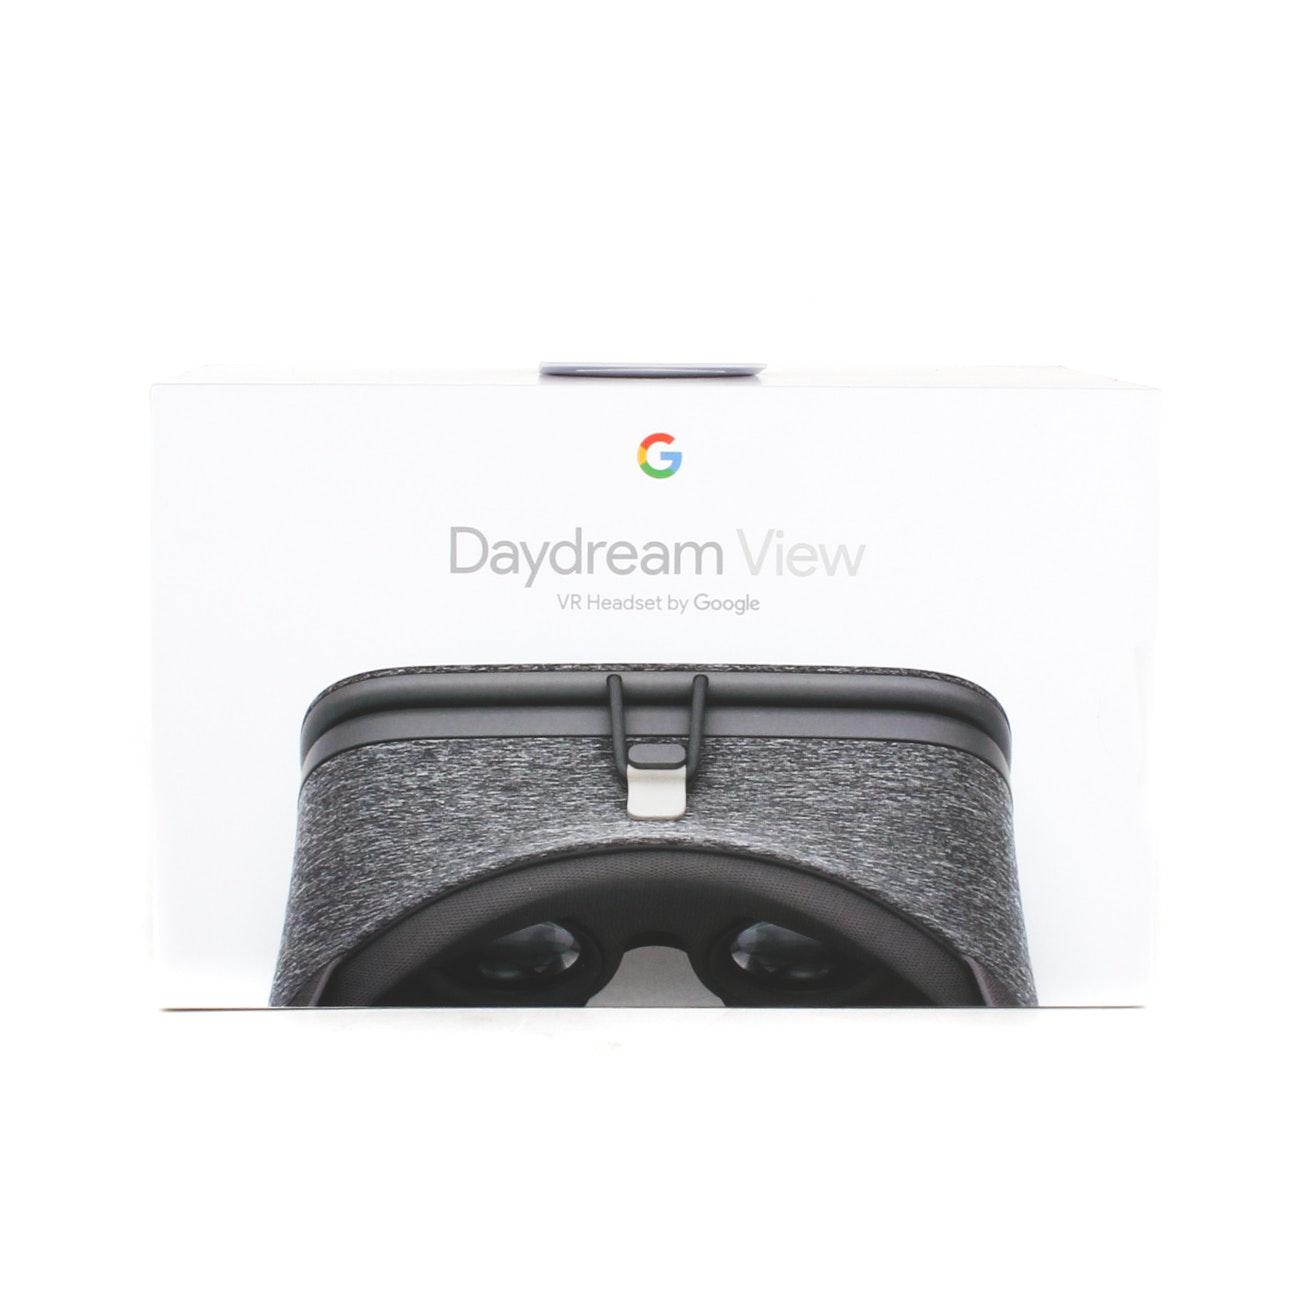 Google Daydream View Virtual Reality Headset